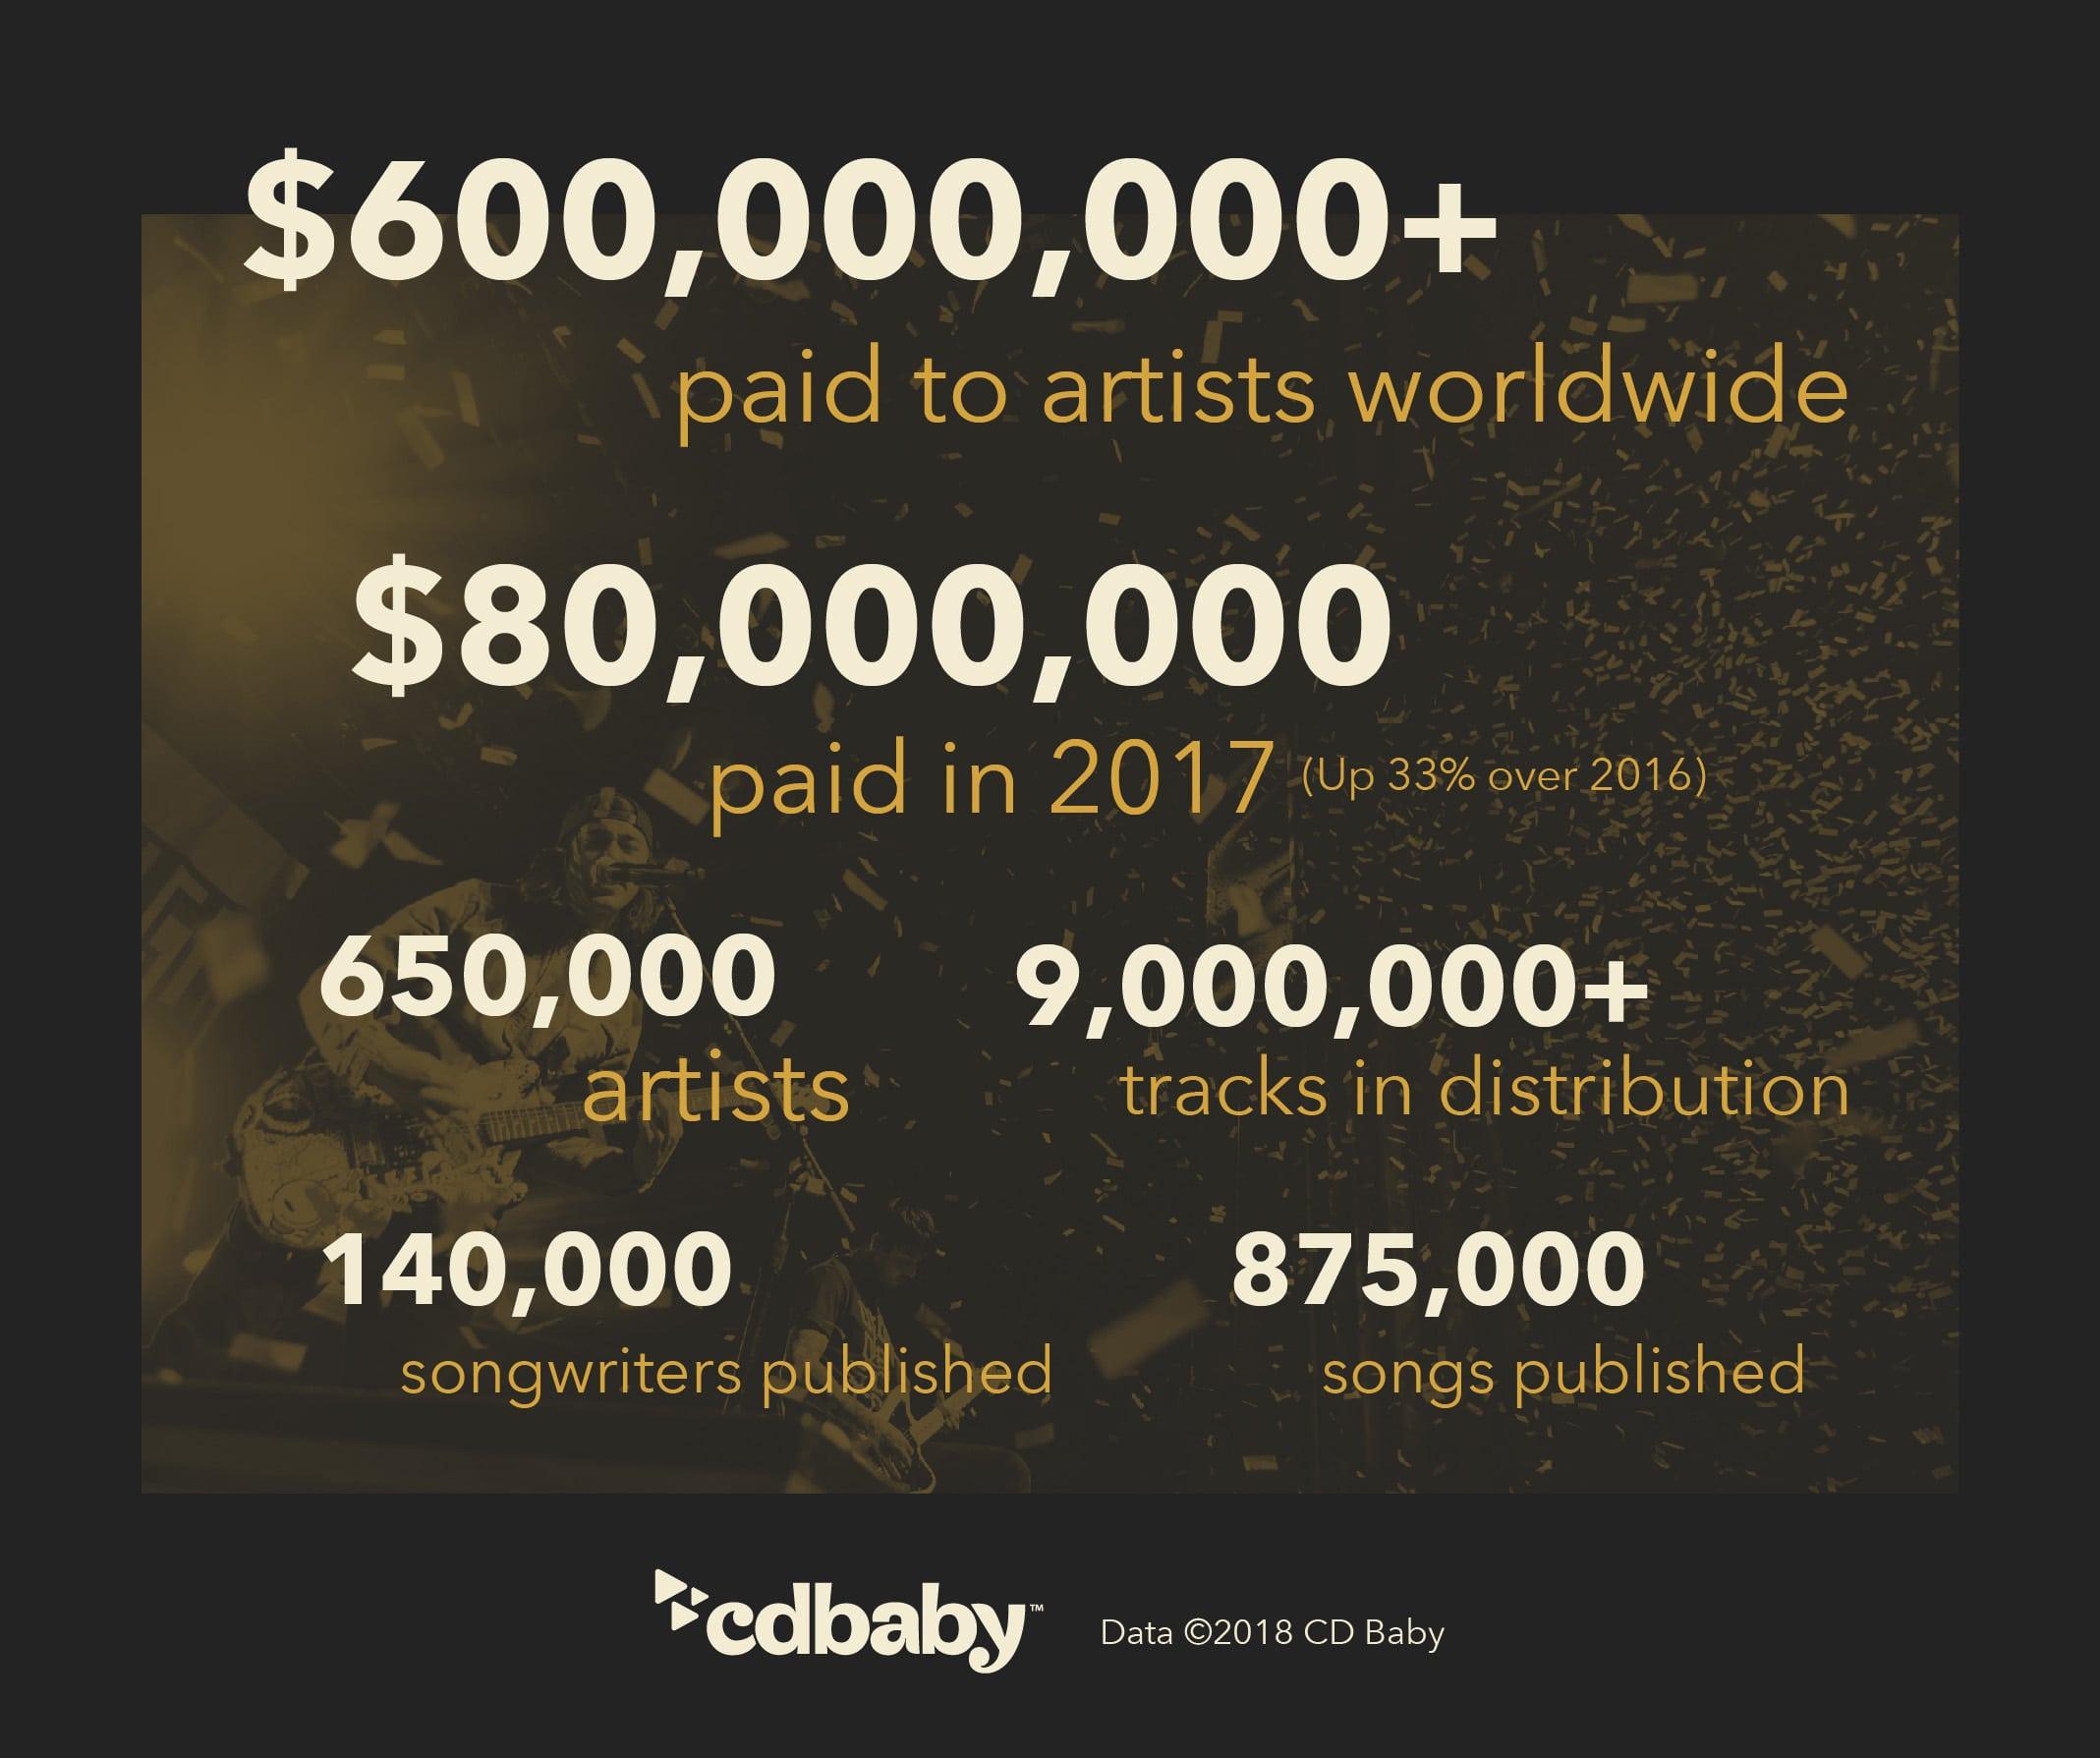 cdbb-infographic-artist-numbers-as-of-2017-end.jpg